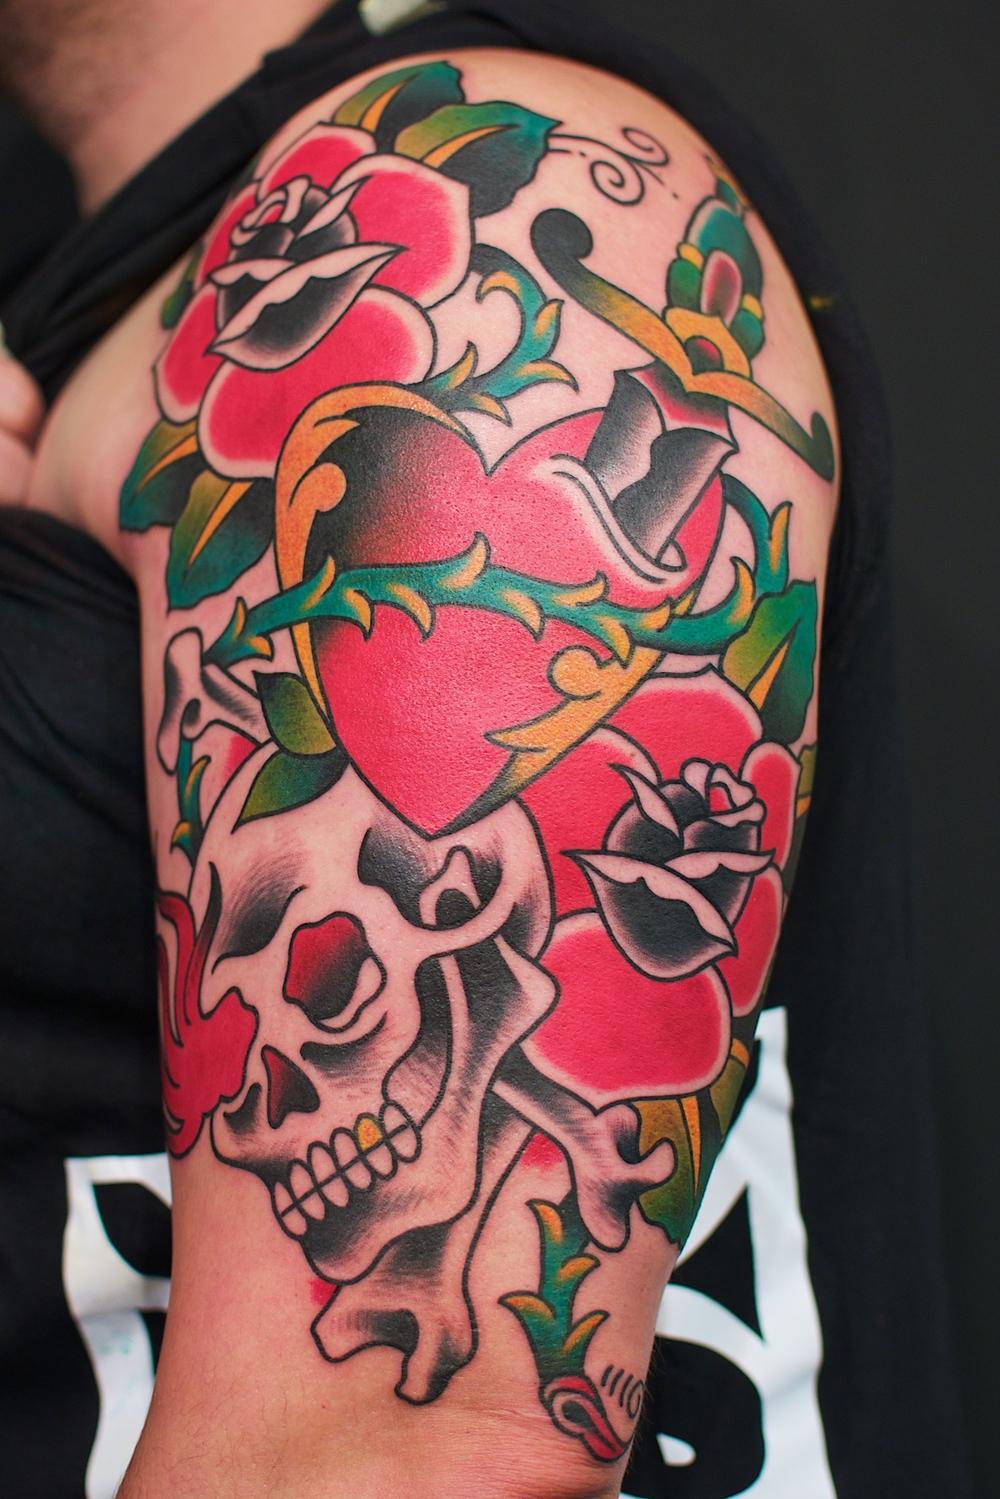 01122012 Tattoos 21 1.jpg